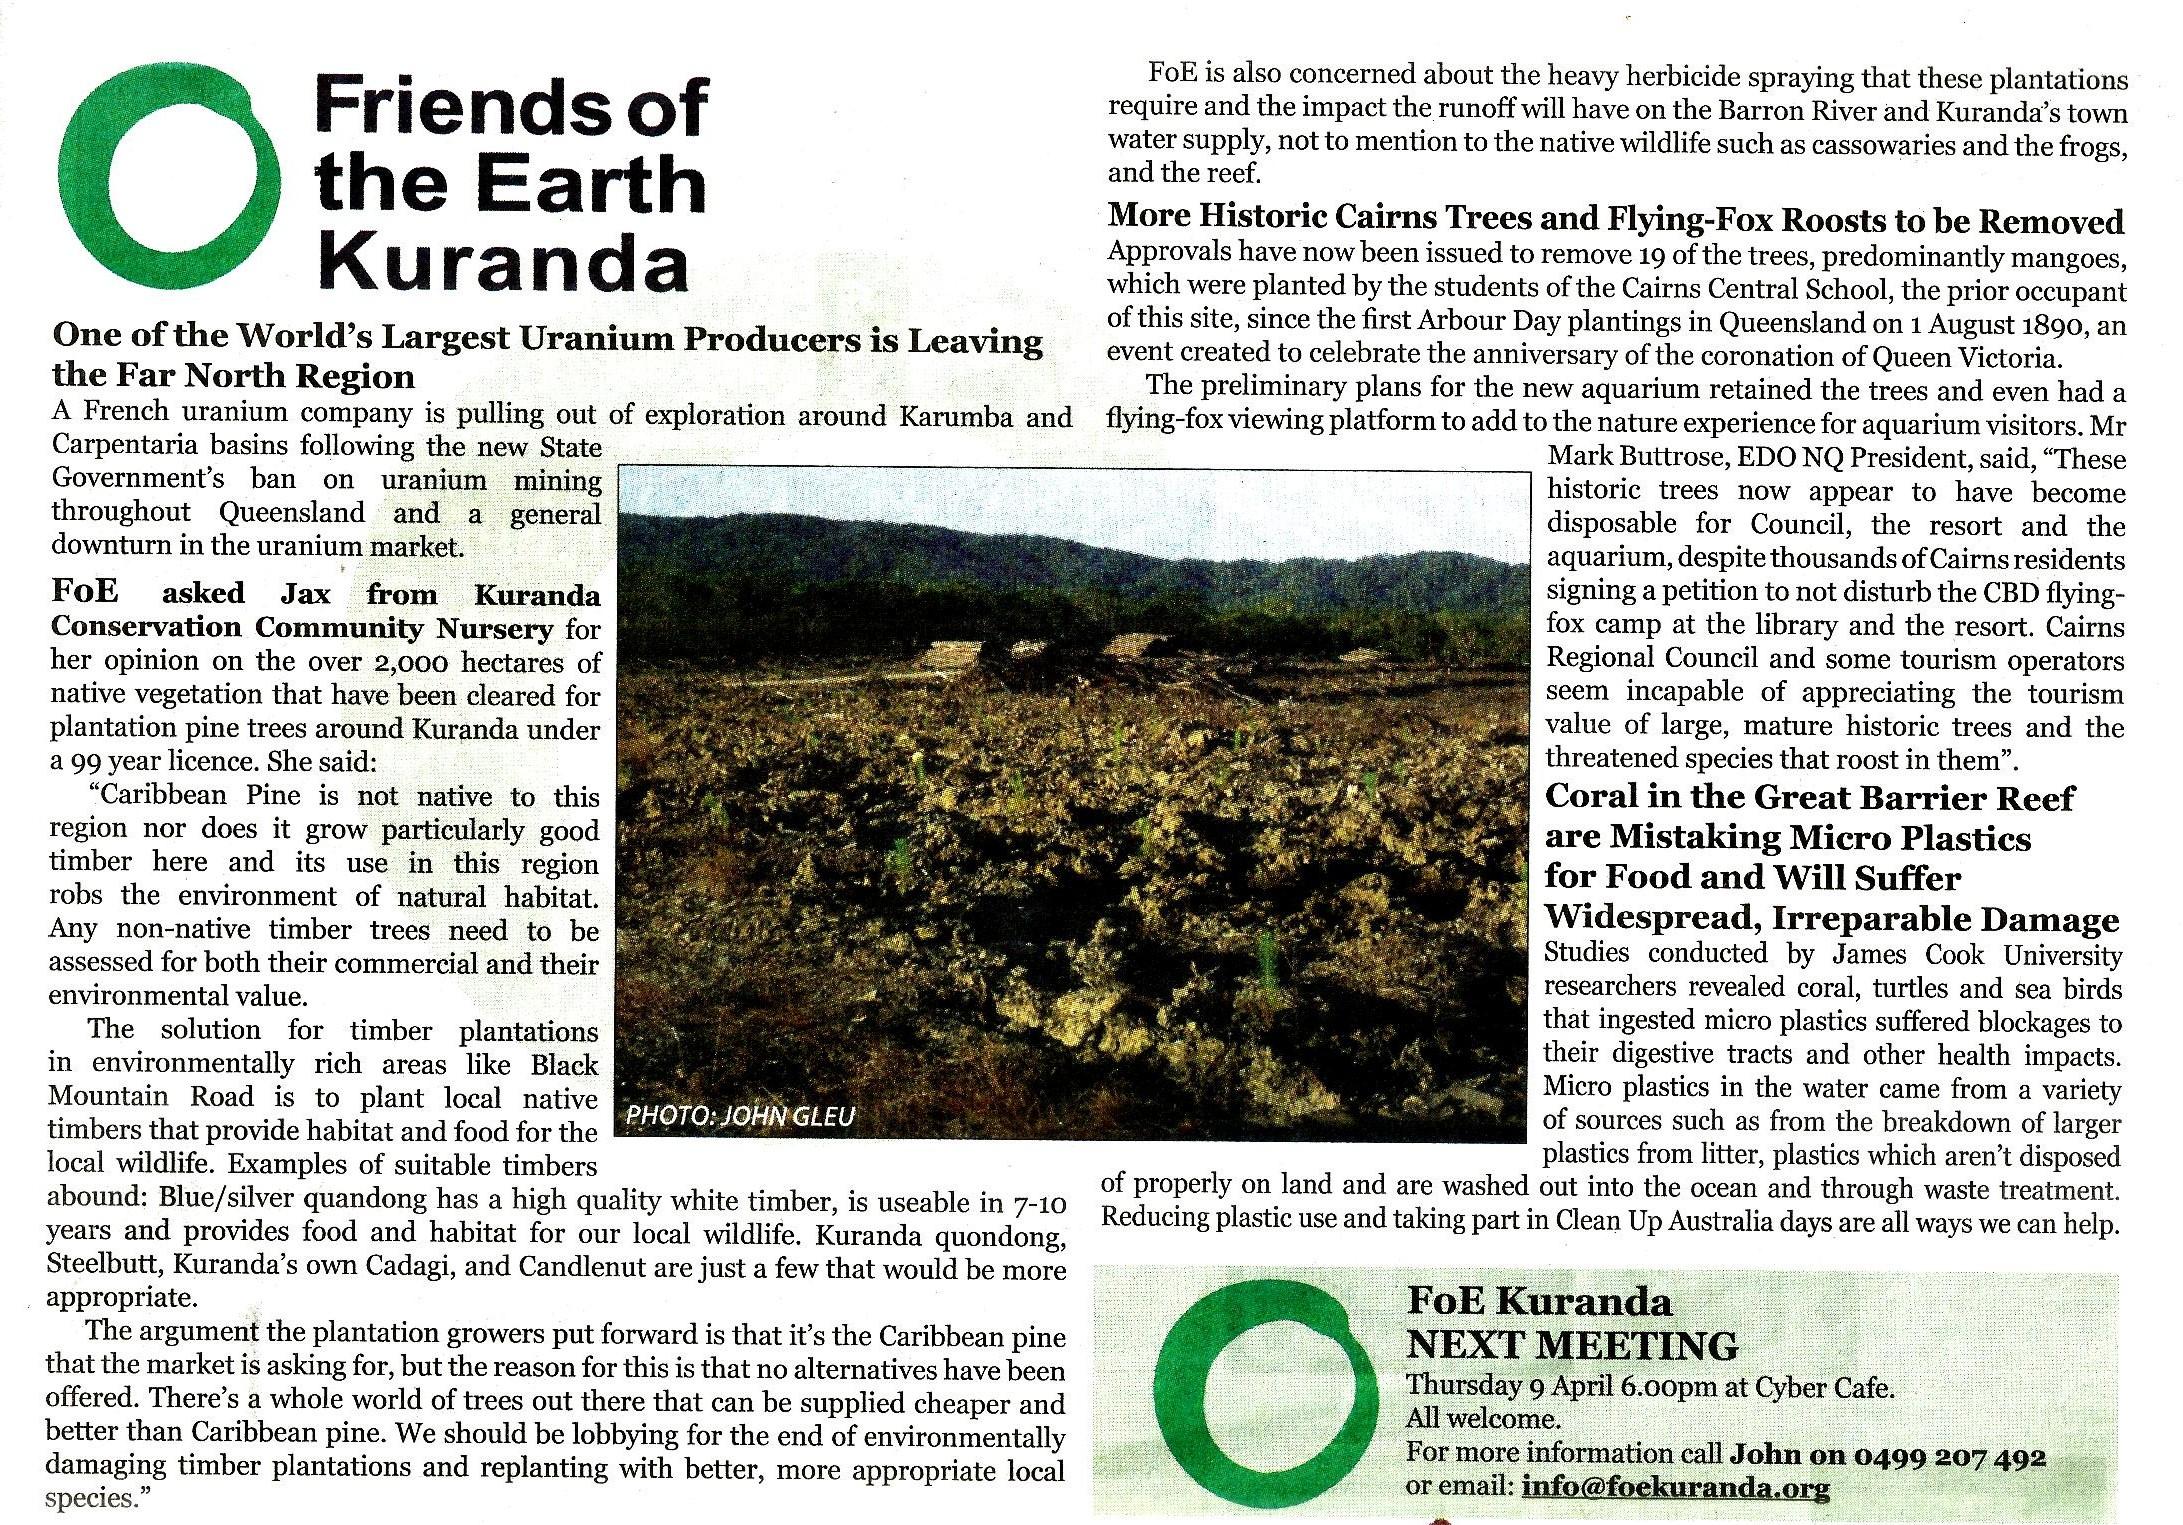 Kuranda-Paper-April-2015-2.jpg